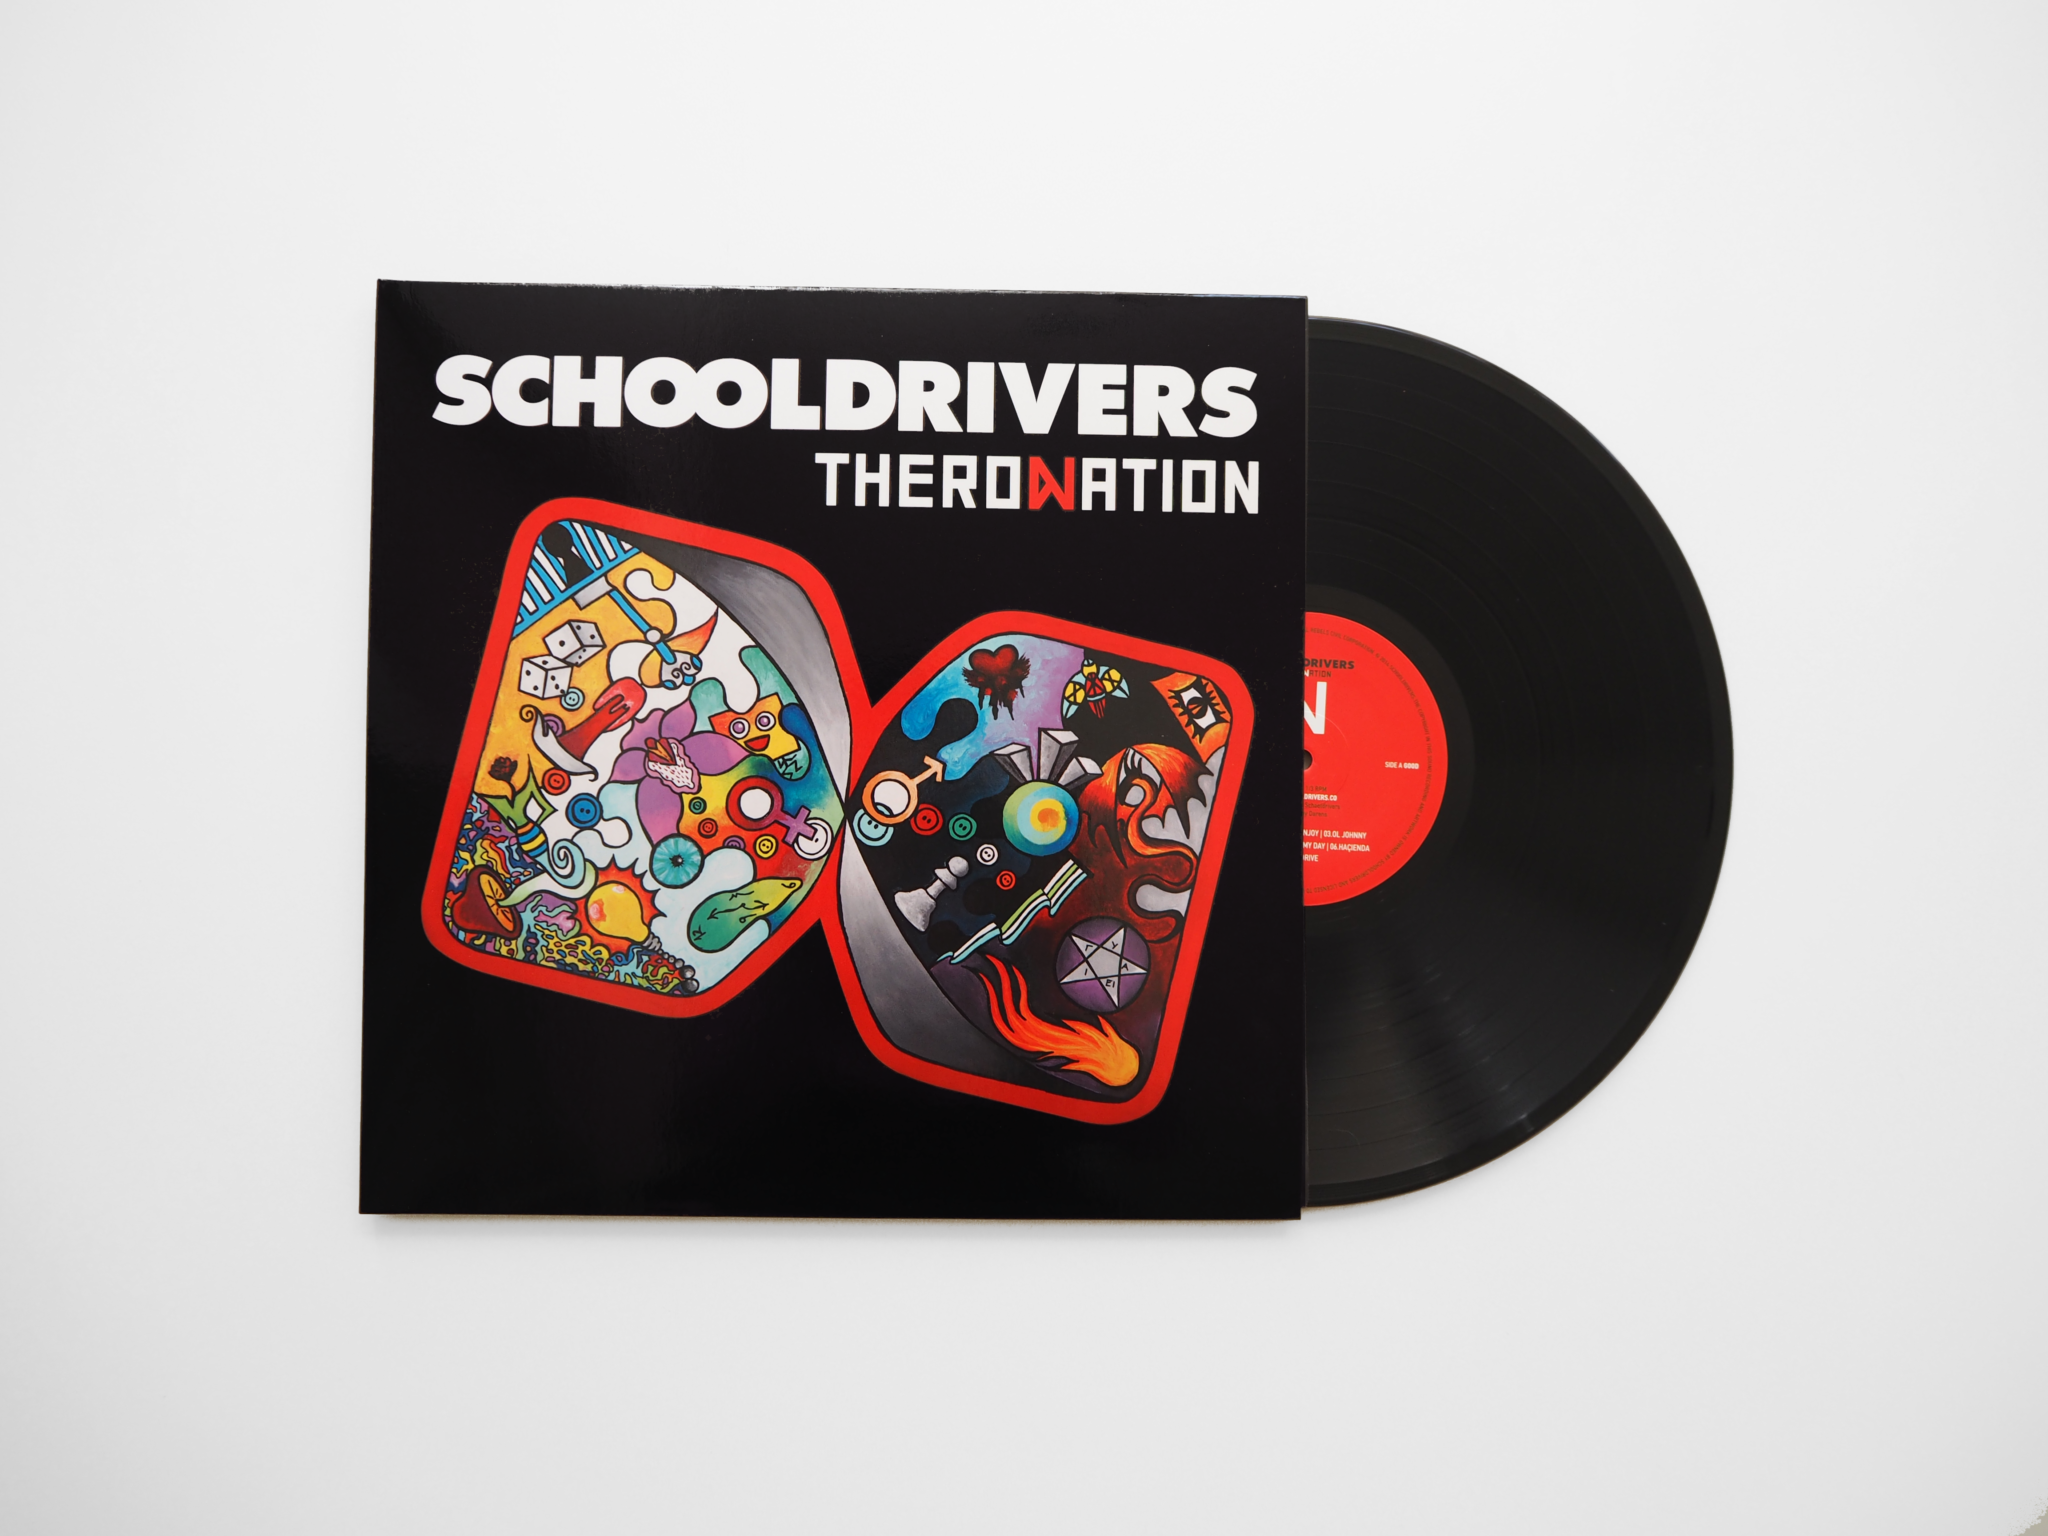 Theronation: A modern rock audiophile vinyl album by Schooldrivers